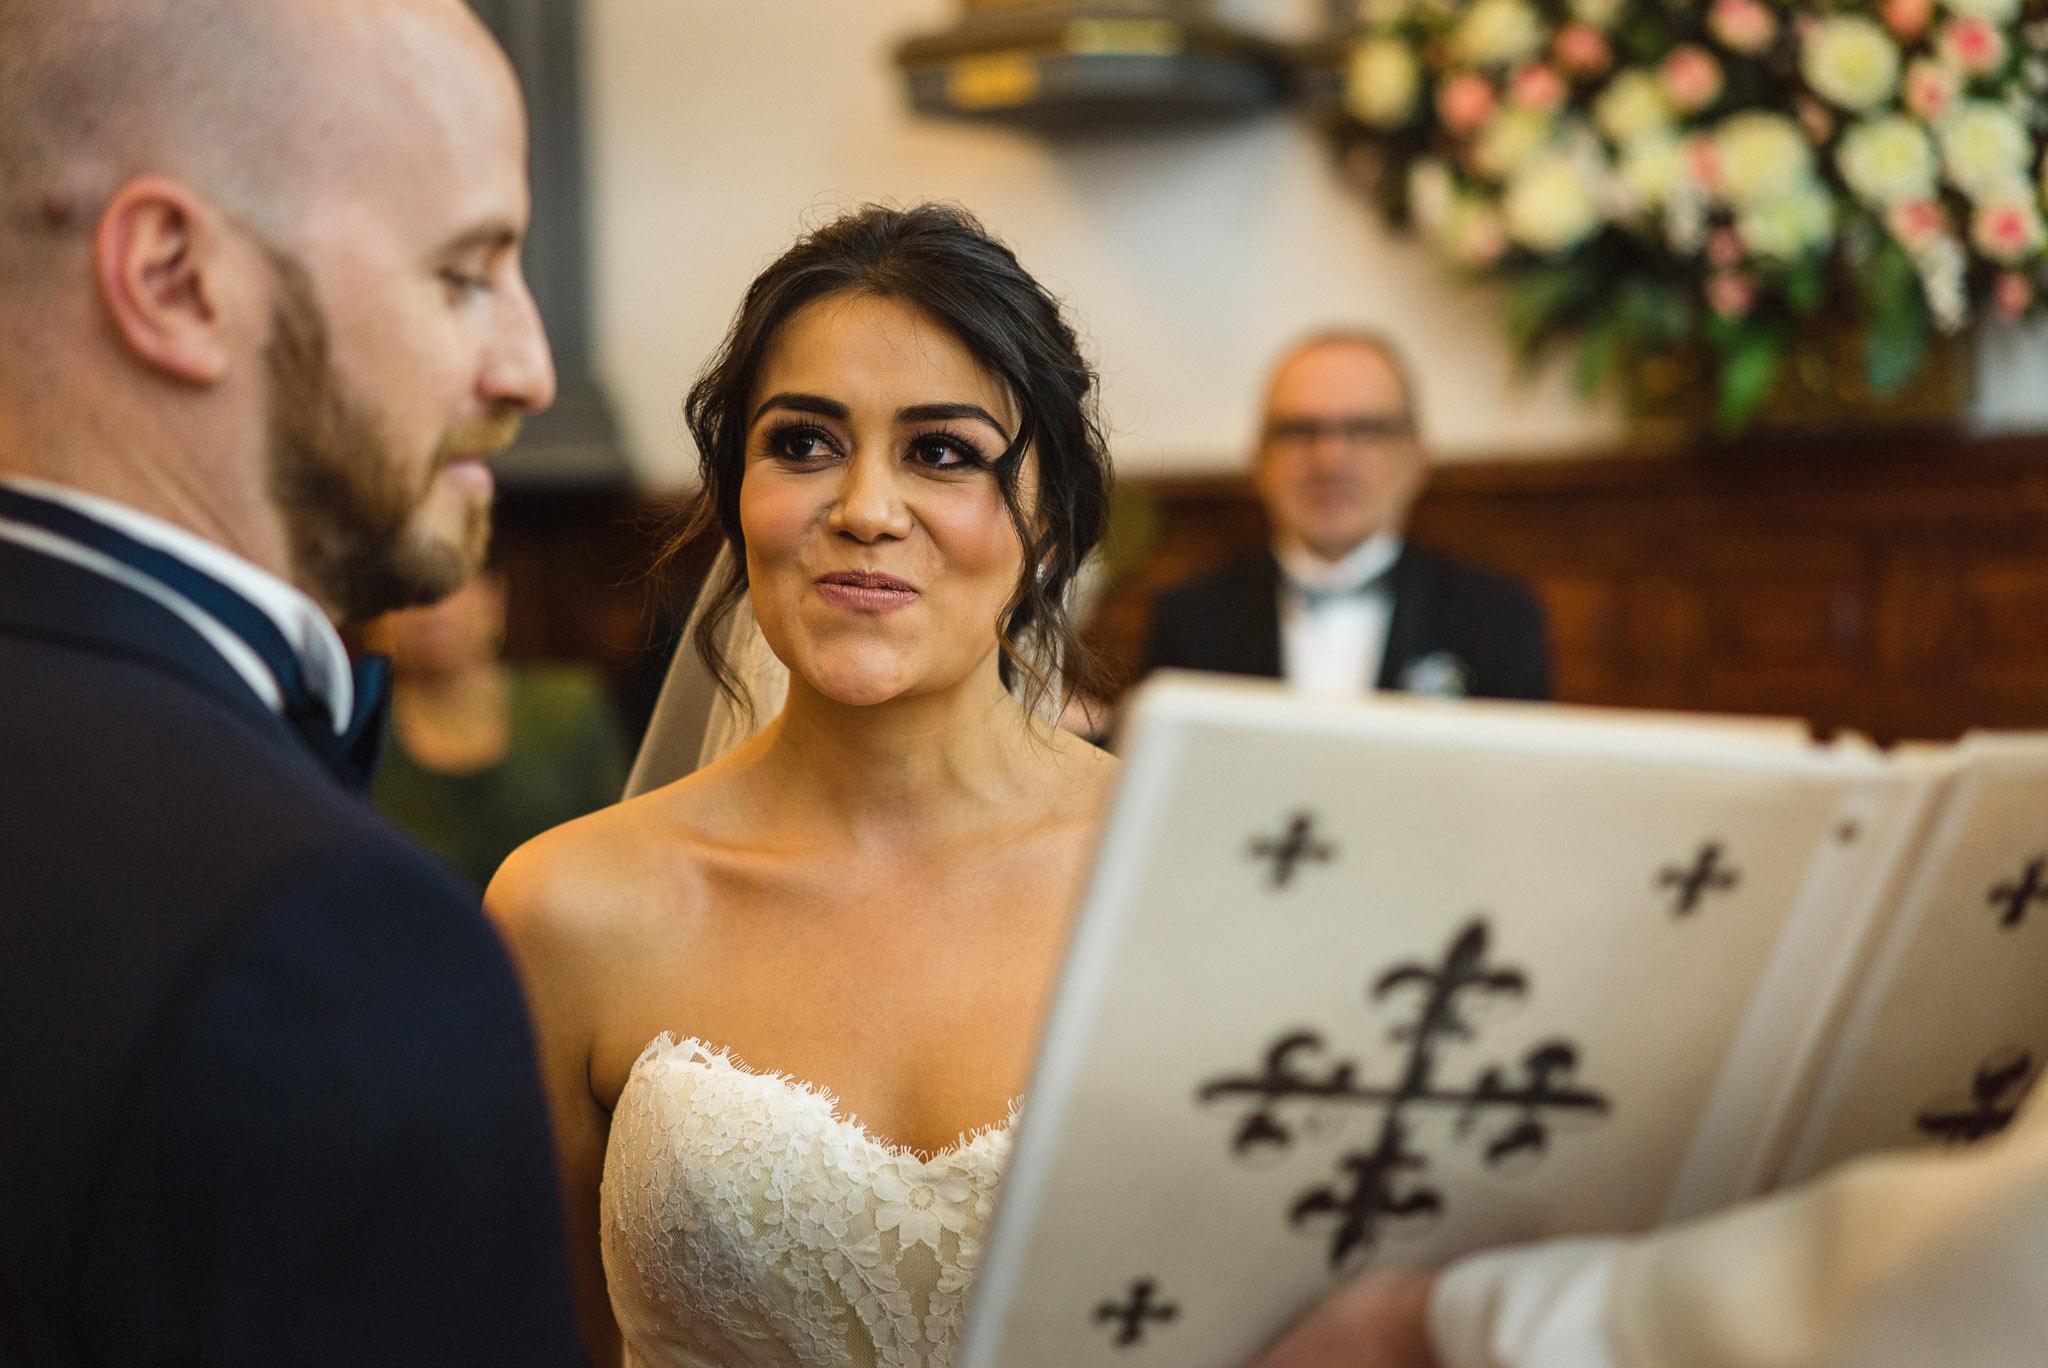 ©www.mauriziosolisbroca.com-20161001maurizio-solis-broca-mexico-canada-wedding-photographer20161001DSC07465-2-Edit.jpg